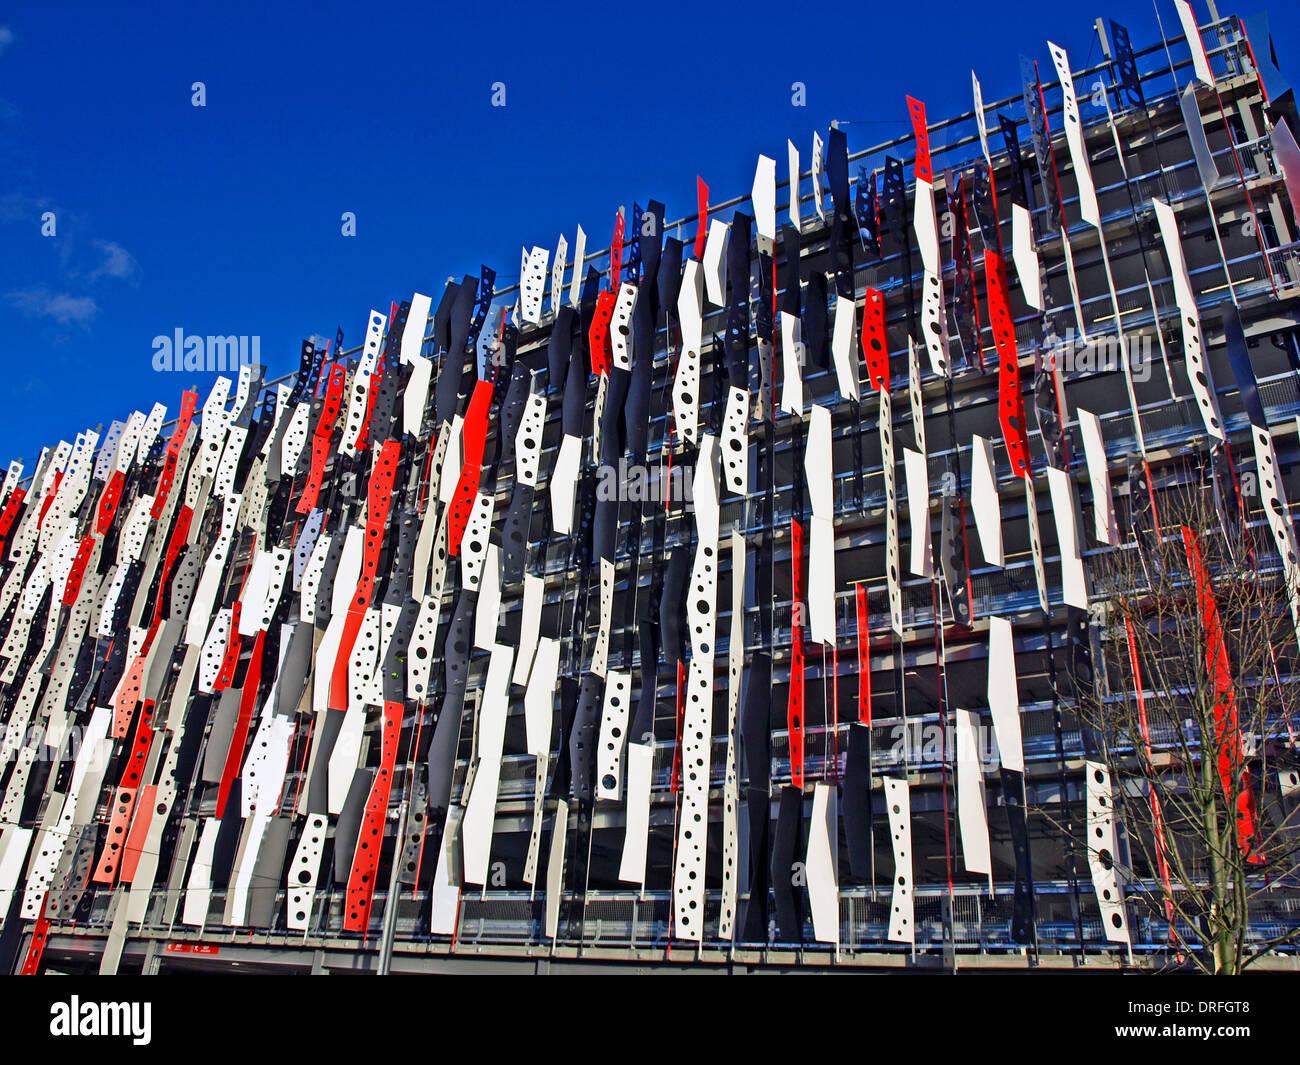 The London Designer Outlet car park, Wembley, London Borough of Brent, London, England, United Kingdom - Stock Image